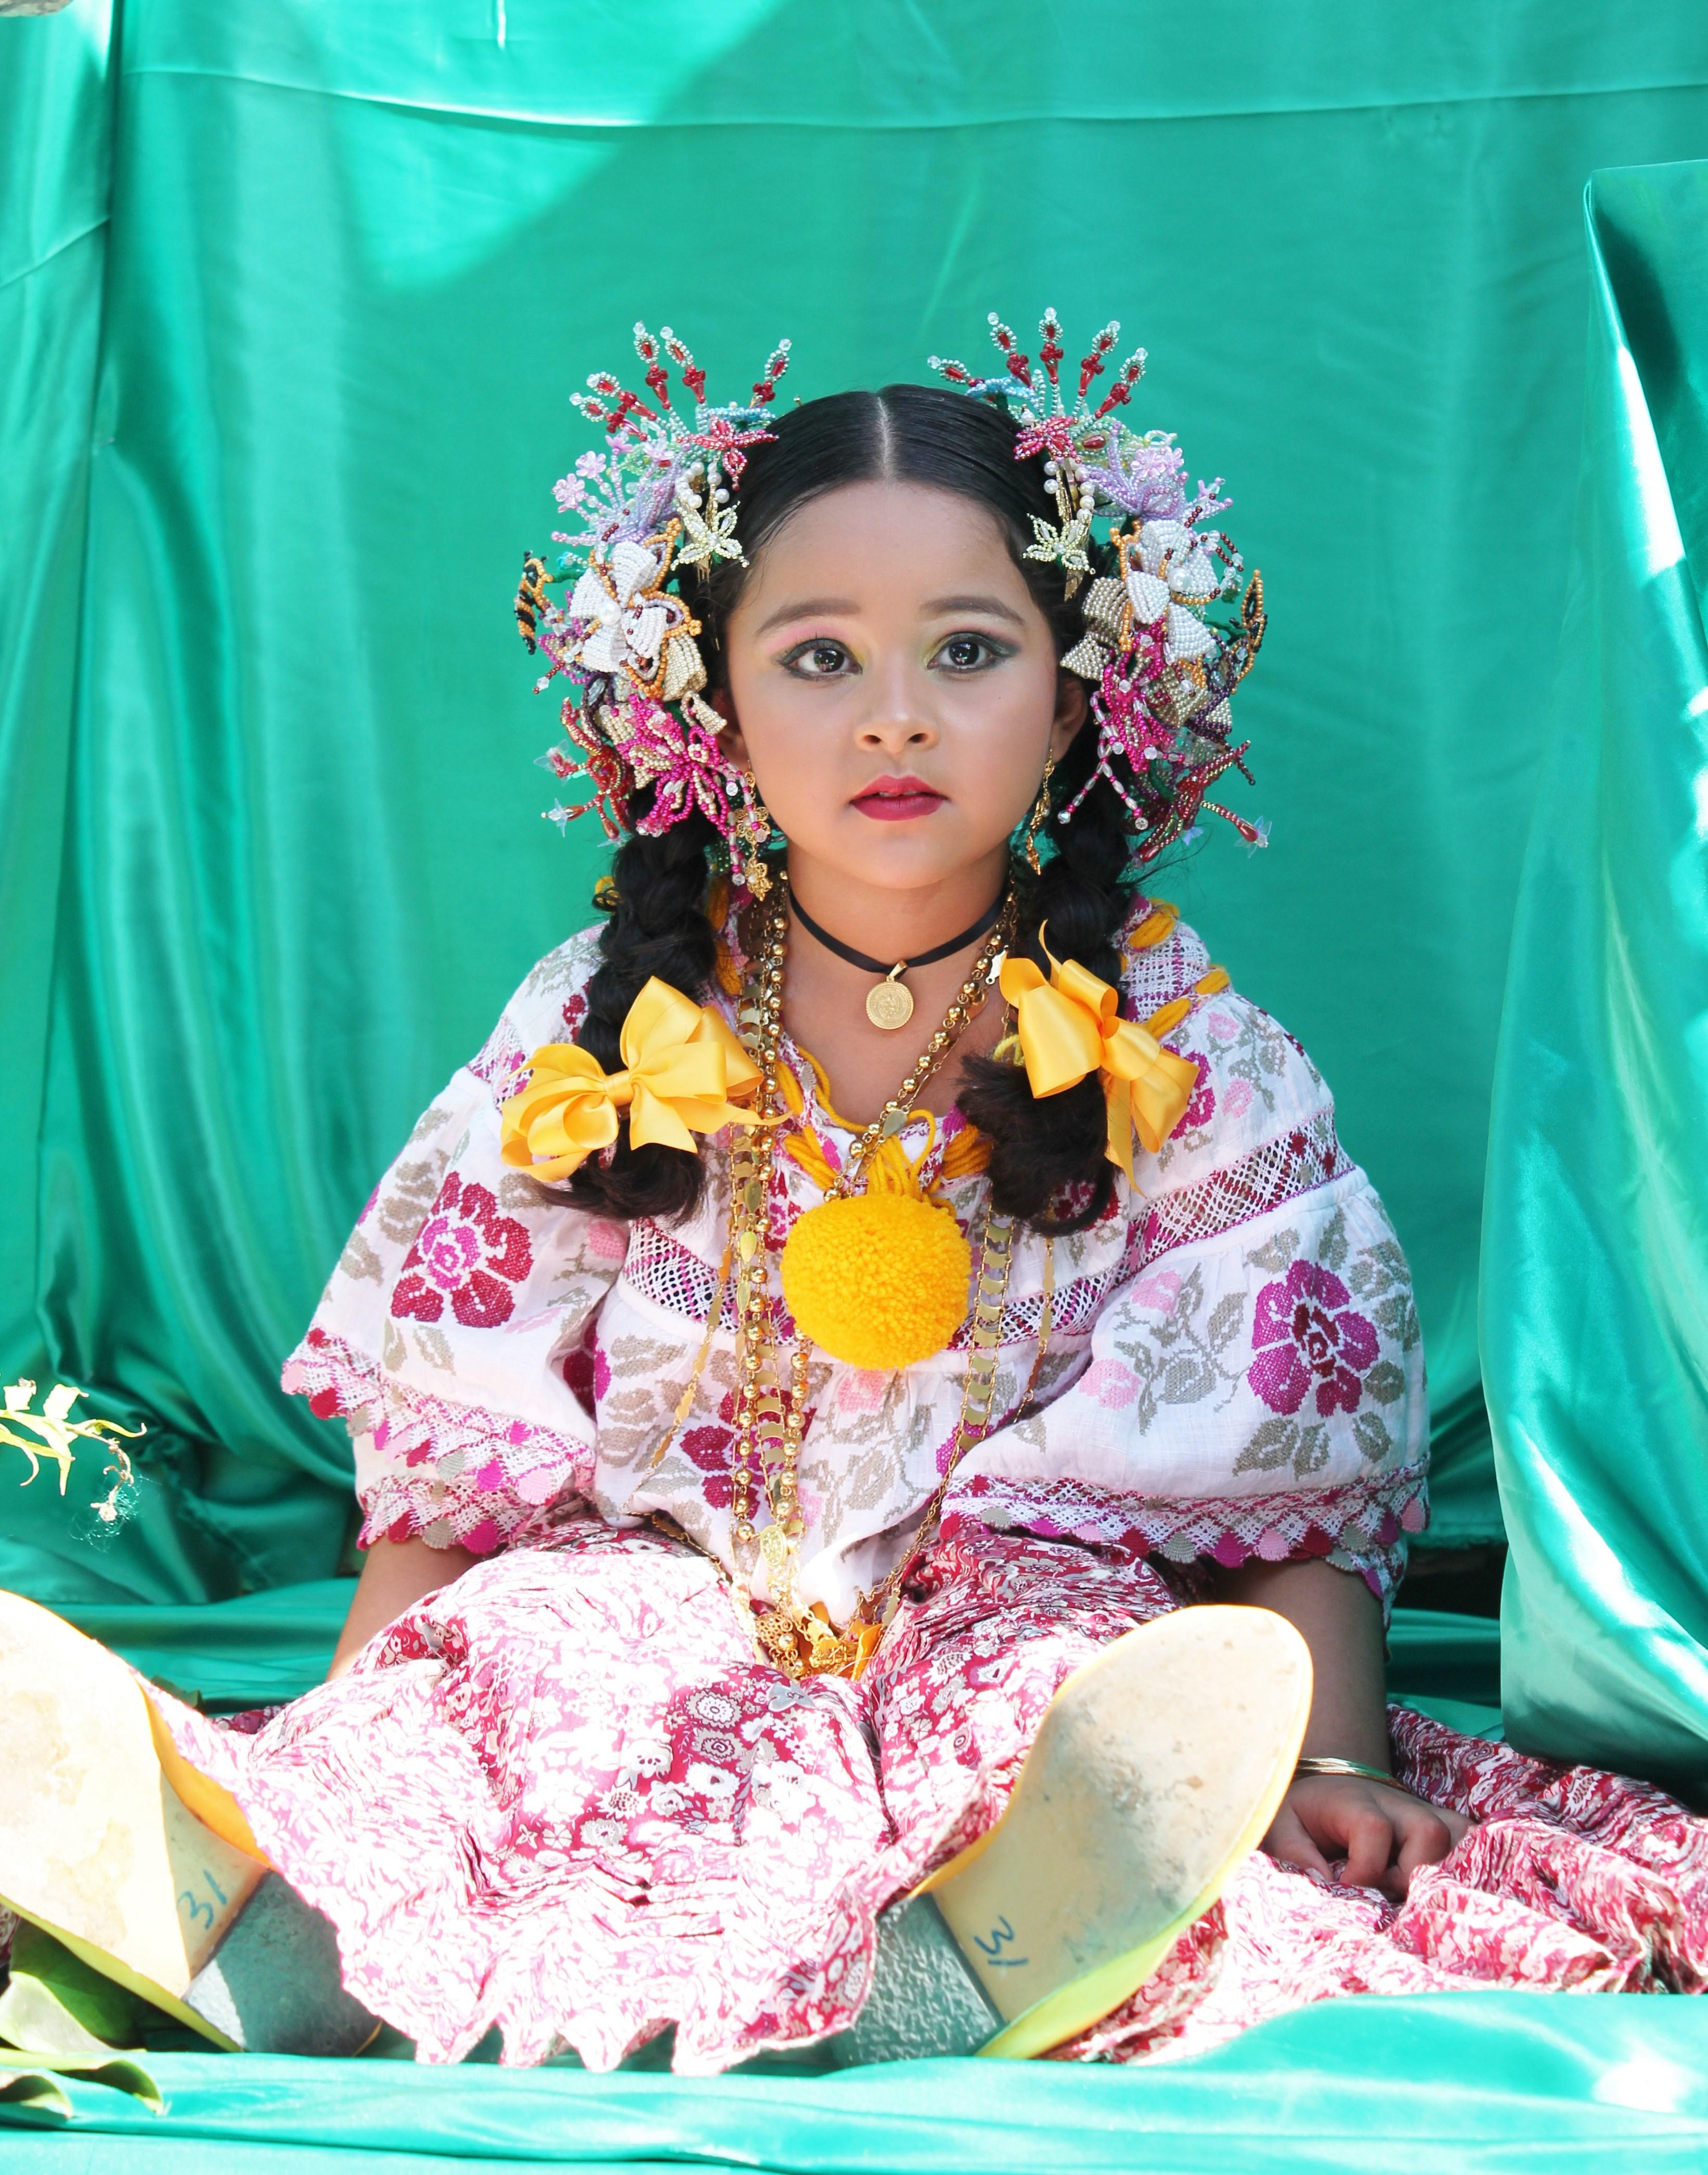 little-china-doll-pollera-parade A Panama Road Trip Panama Panama Fairs and Festivals